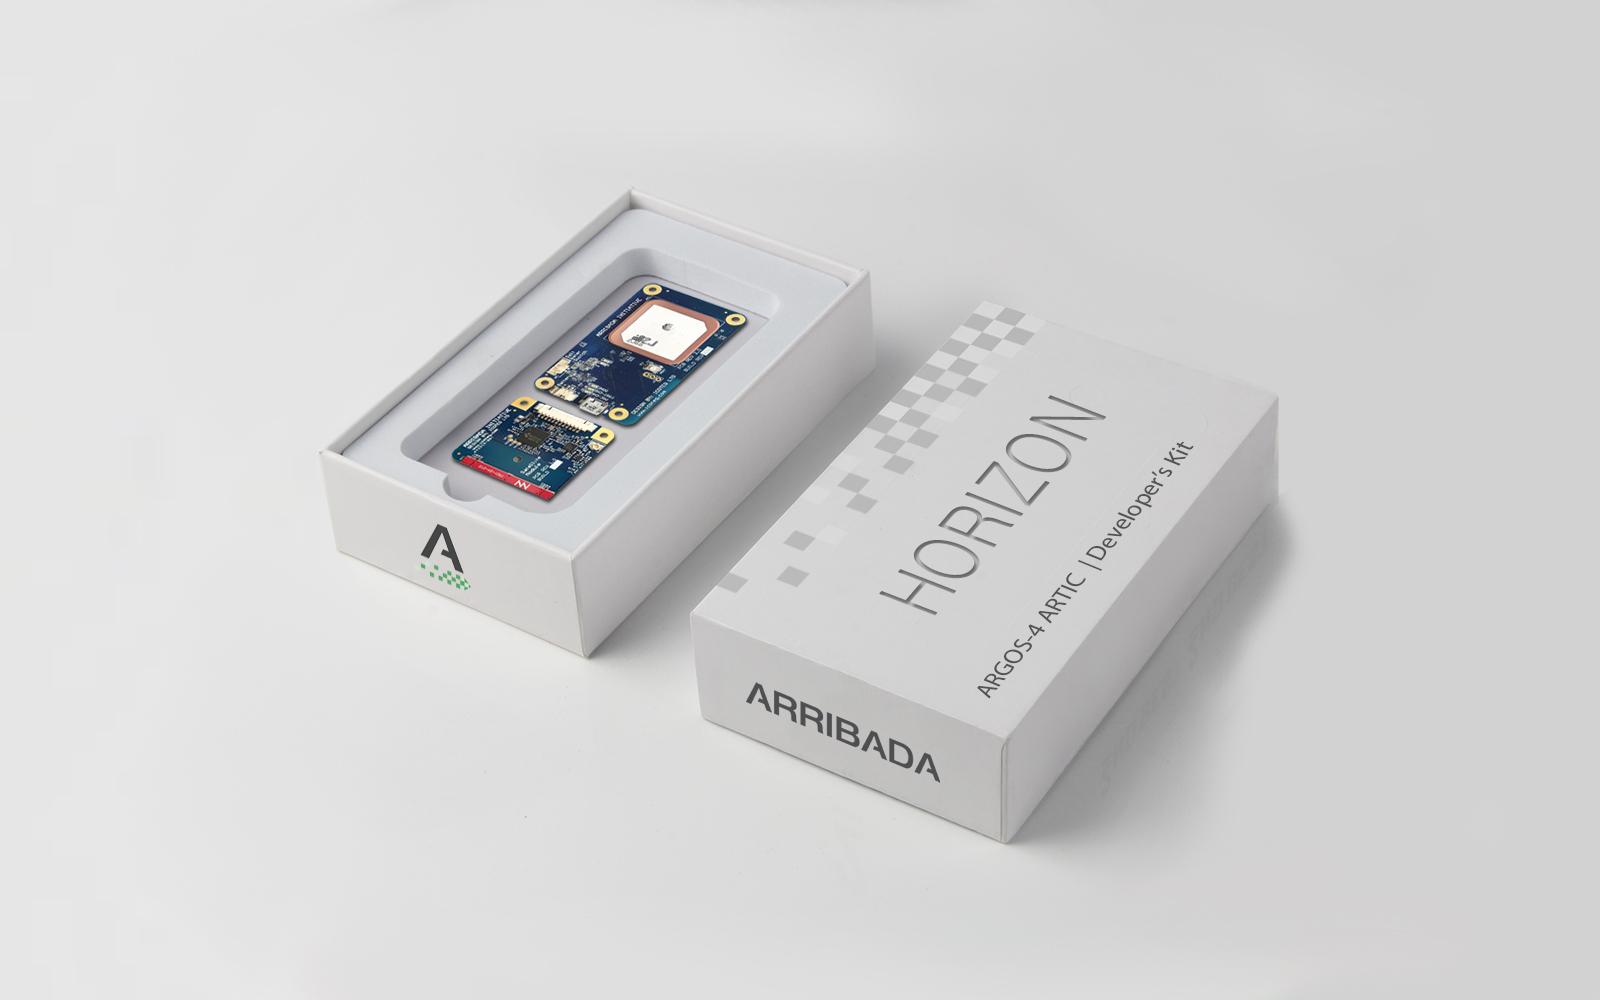 Argos satellite developers kit